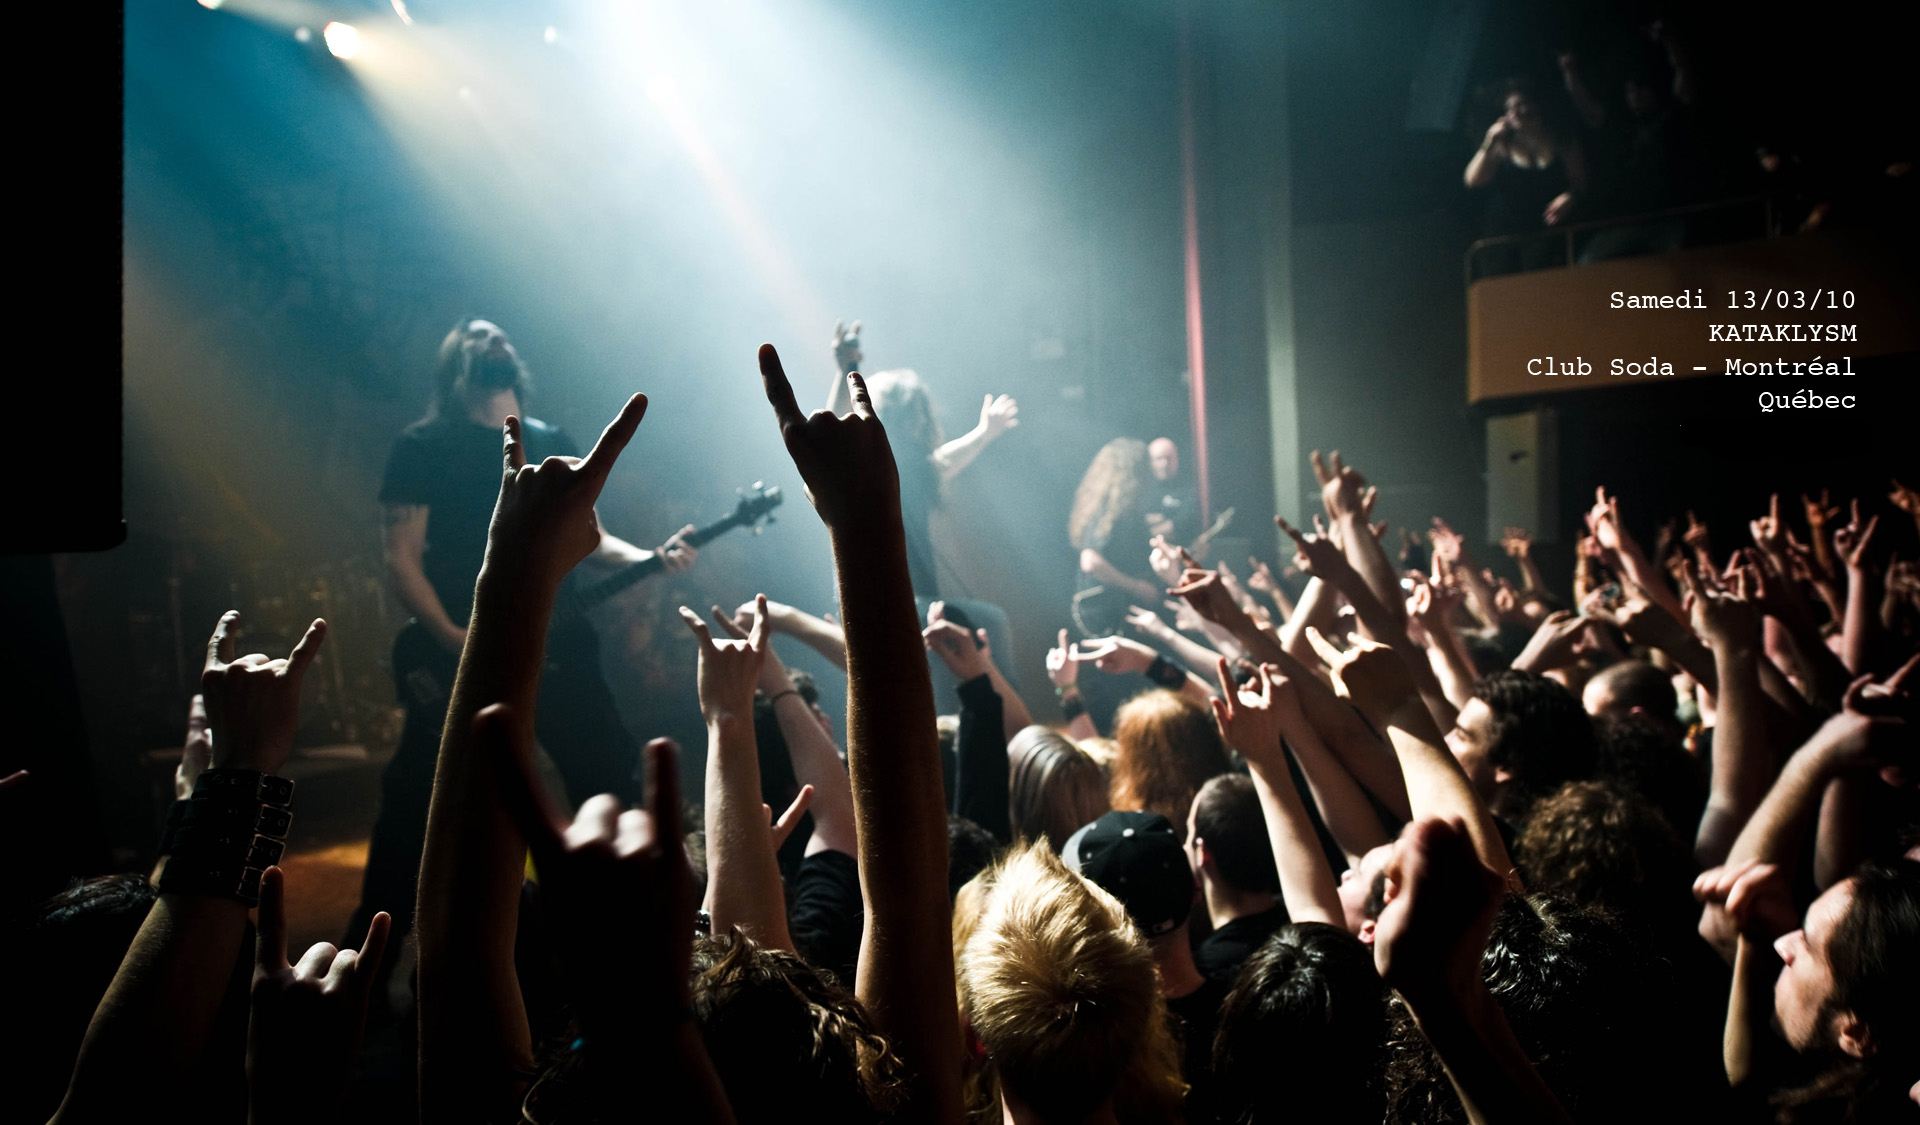 kataklysm death metal heavy hard rock concert concerts crowd wallpaper 1920x1125